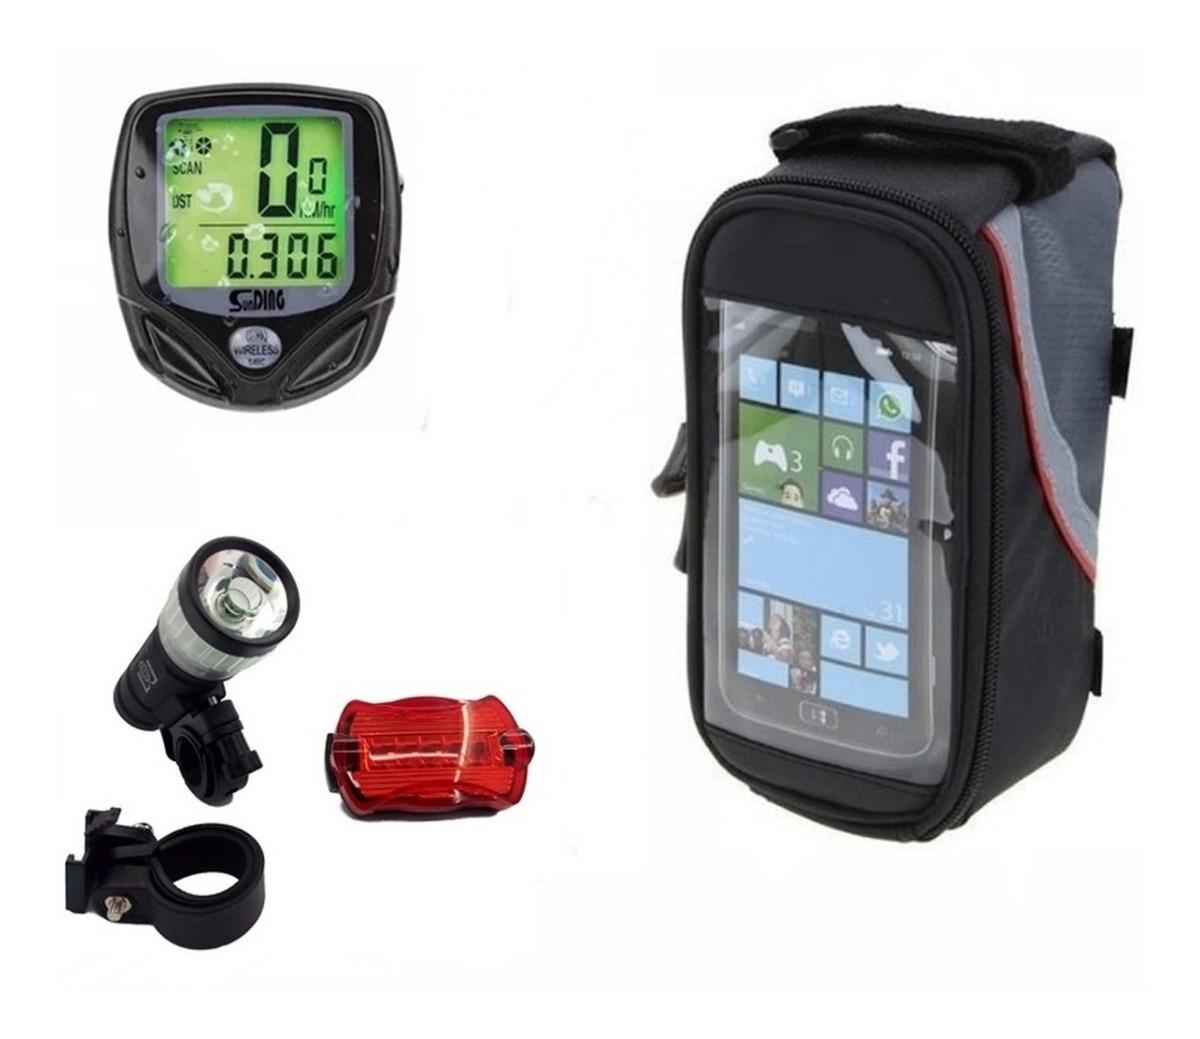 f286c6db8 Kit Bike Case Lanterna Zoom Pisca Velocimetro S/fio Luz Not. - R$ 90 ...